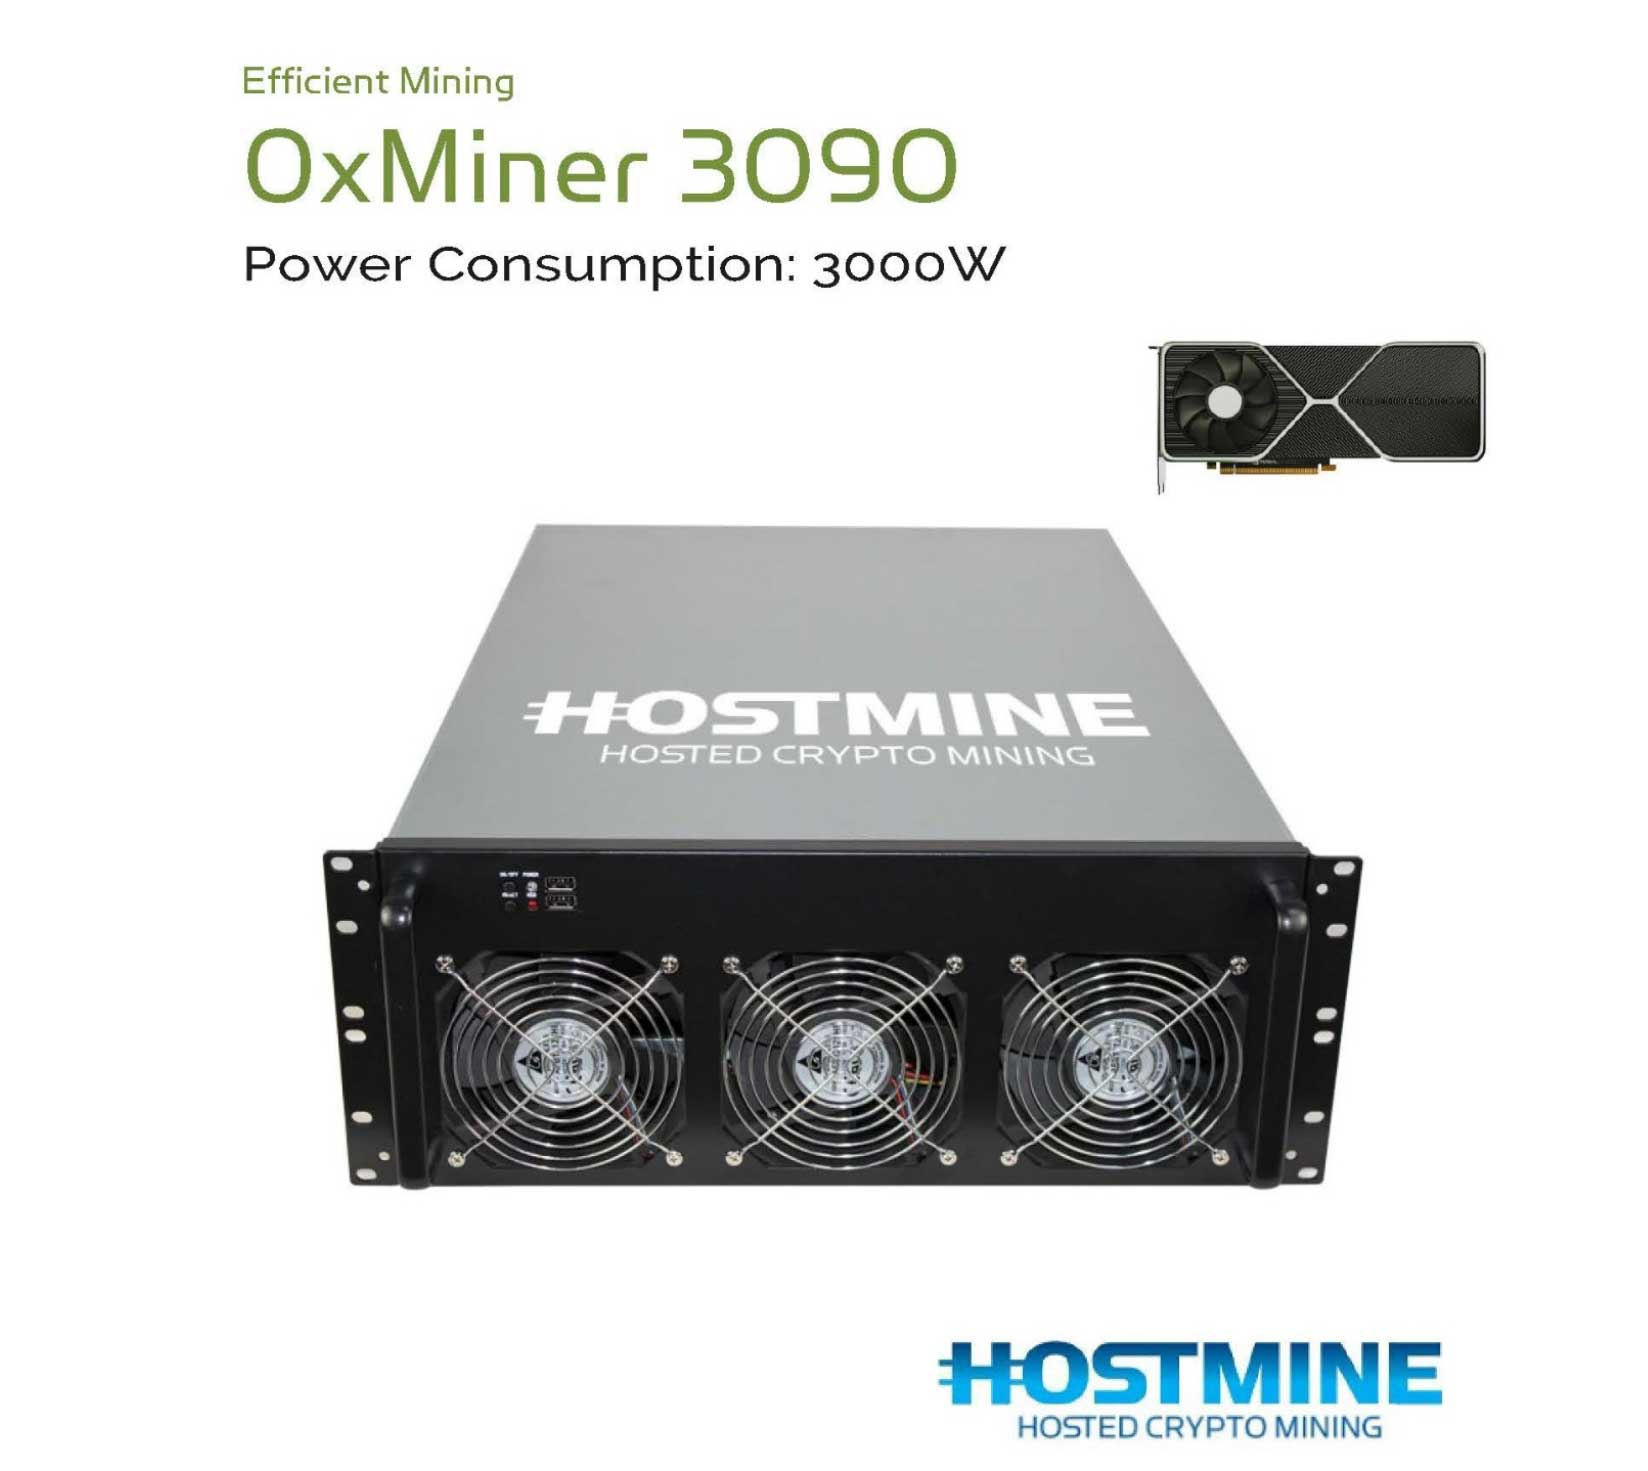 0xMiner 3090 5